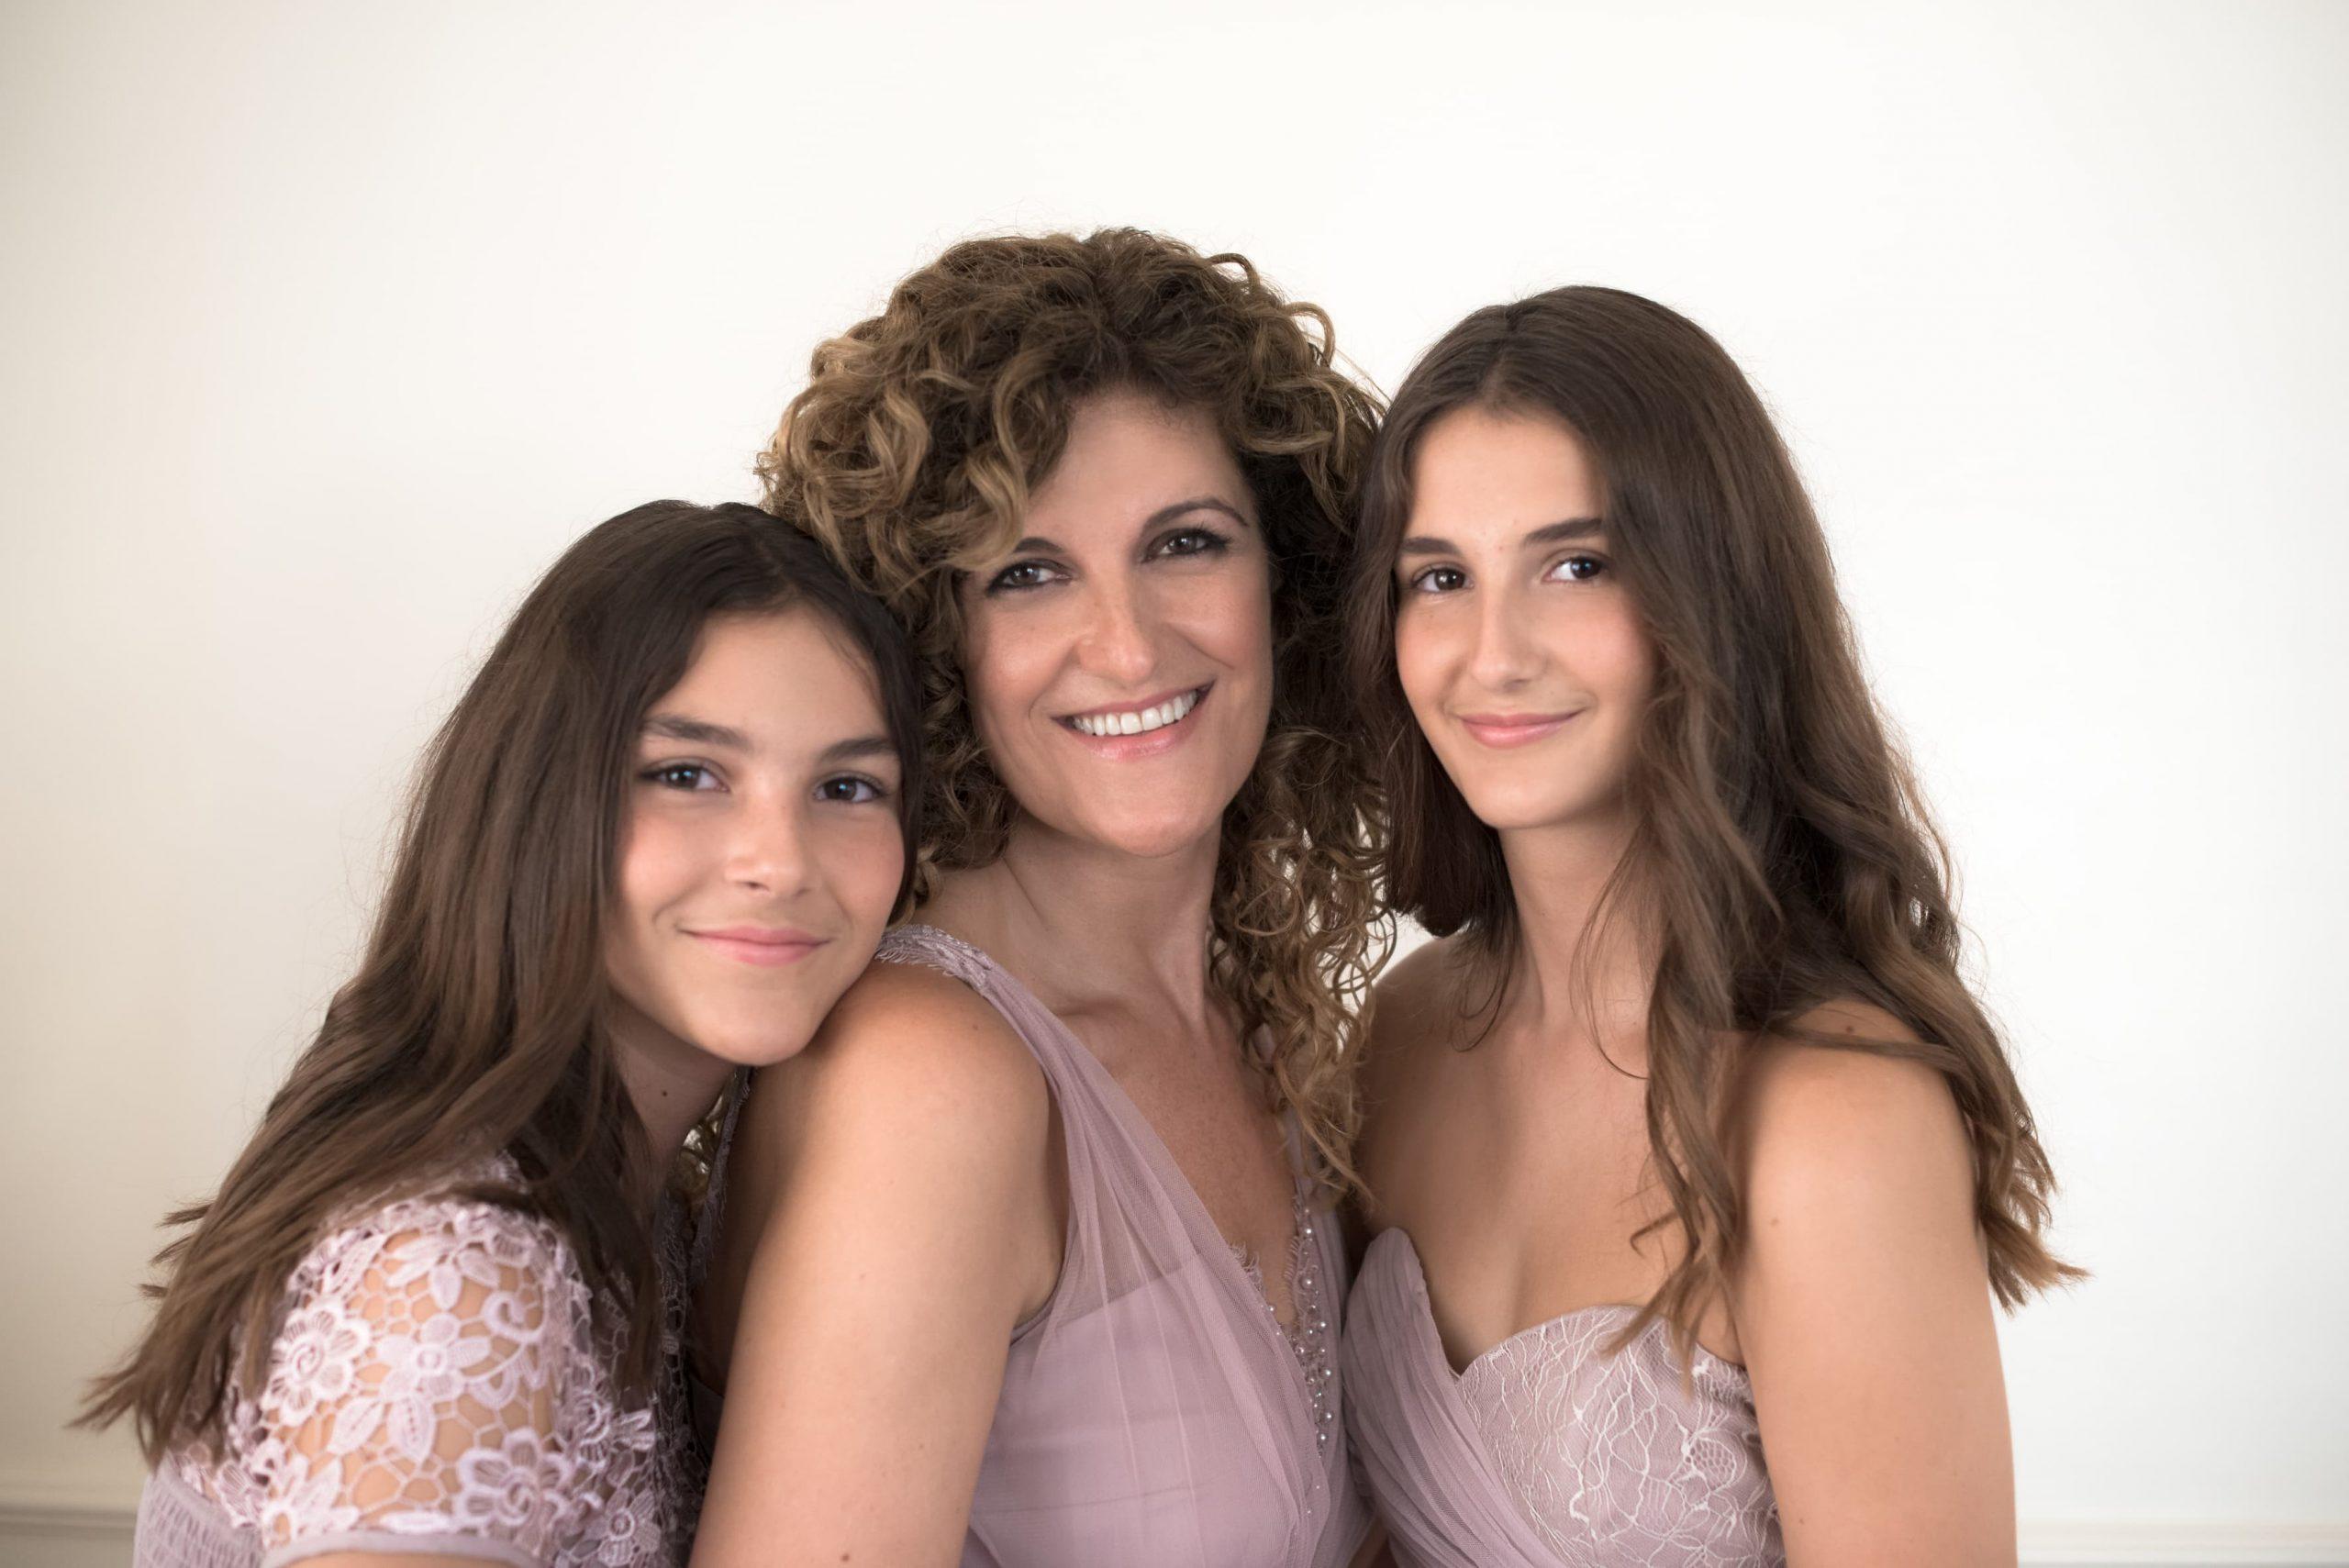 Family Portraits familie fotoshoot moeder en dochter roze jurk